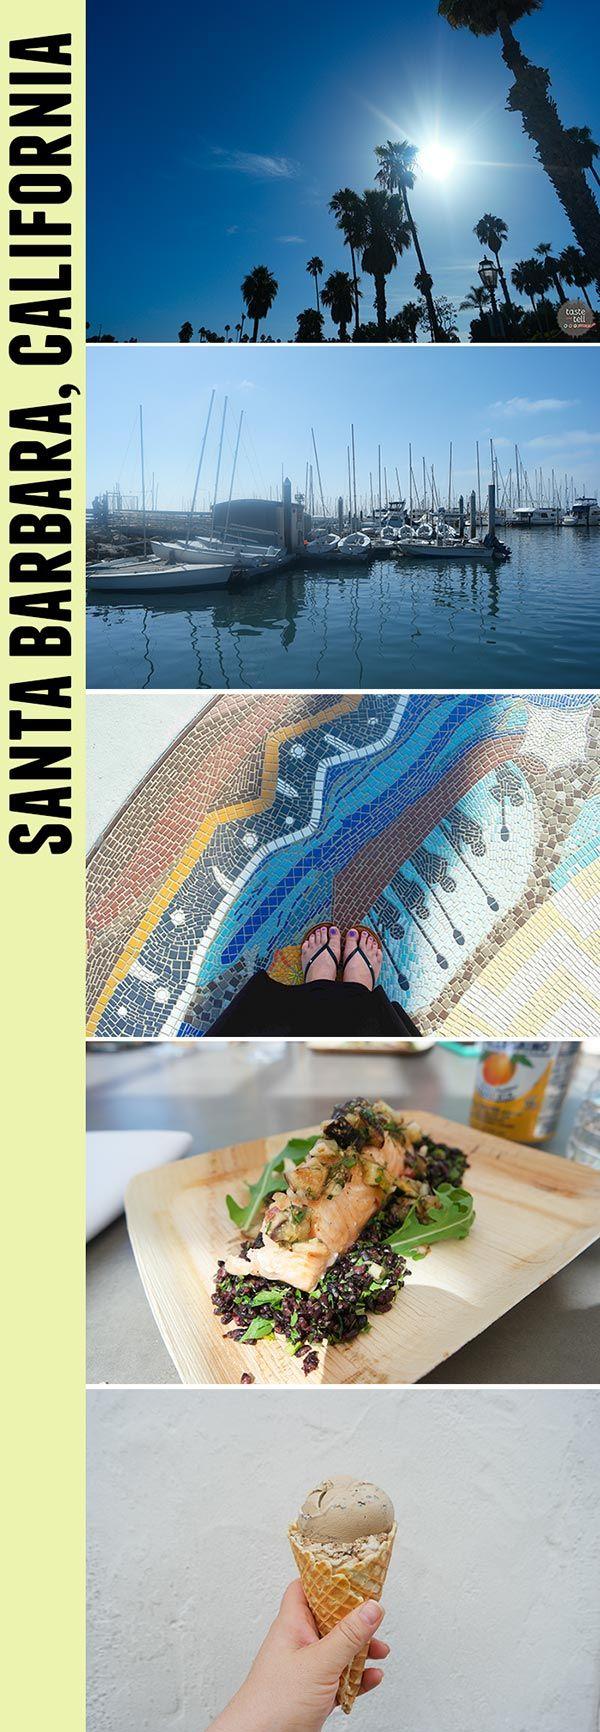 A day in Santa Barbara, California, while on a Princess Cruise.